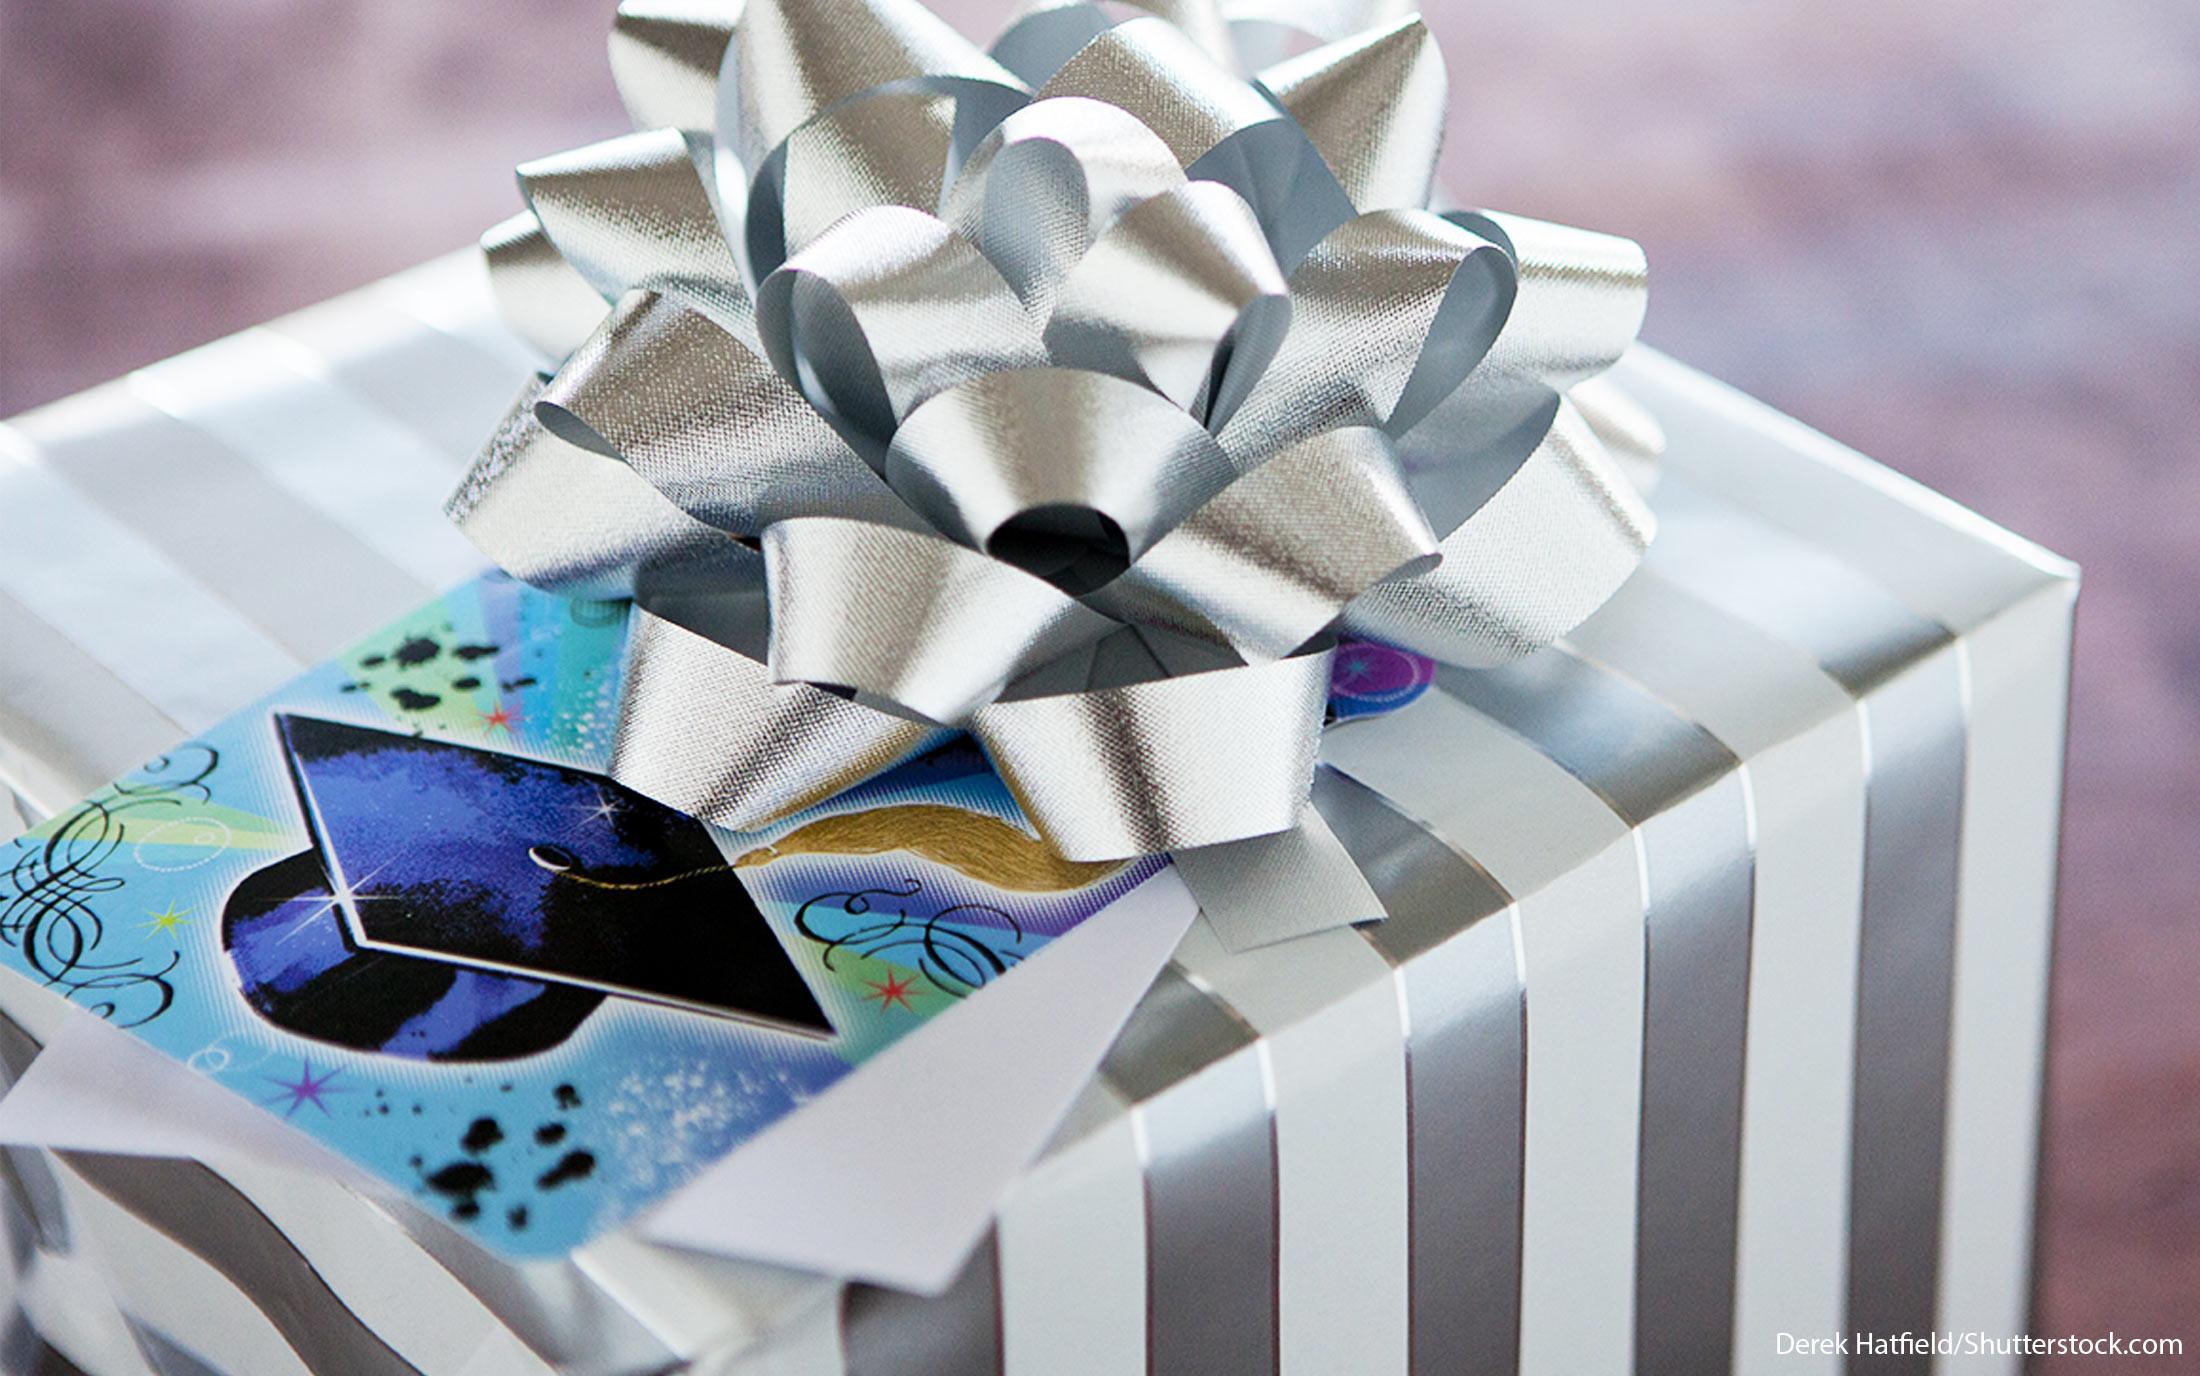 Best ideas about Last Minute Graduation Gift Ideas . Save or Pin 16 Last Minute Graduation Gifts Under $30 Now.